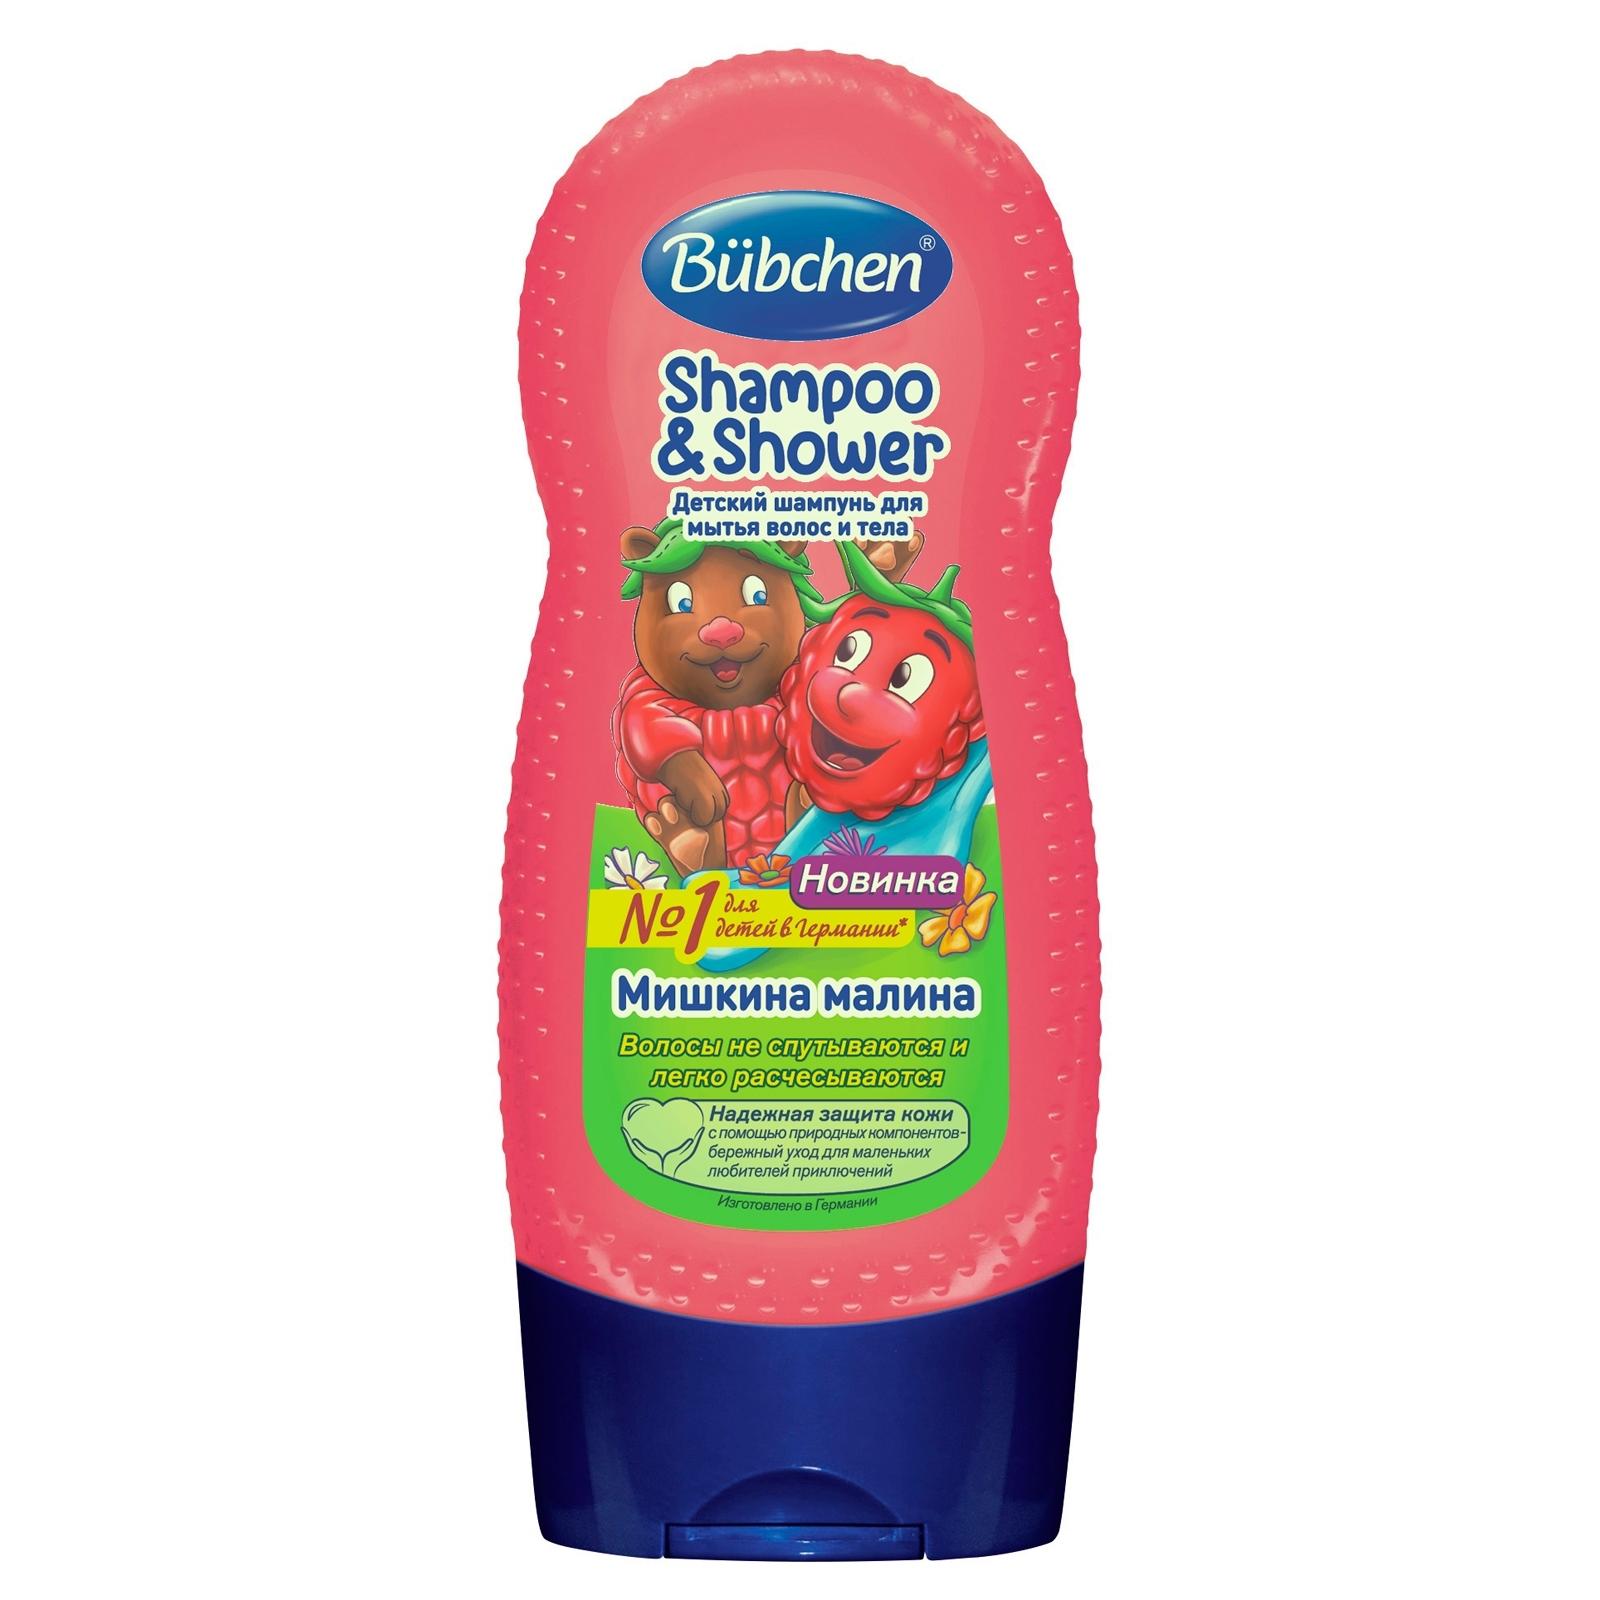 ������� Bubchen ��� ����� � ���� 230 �� ������� ������